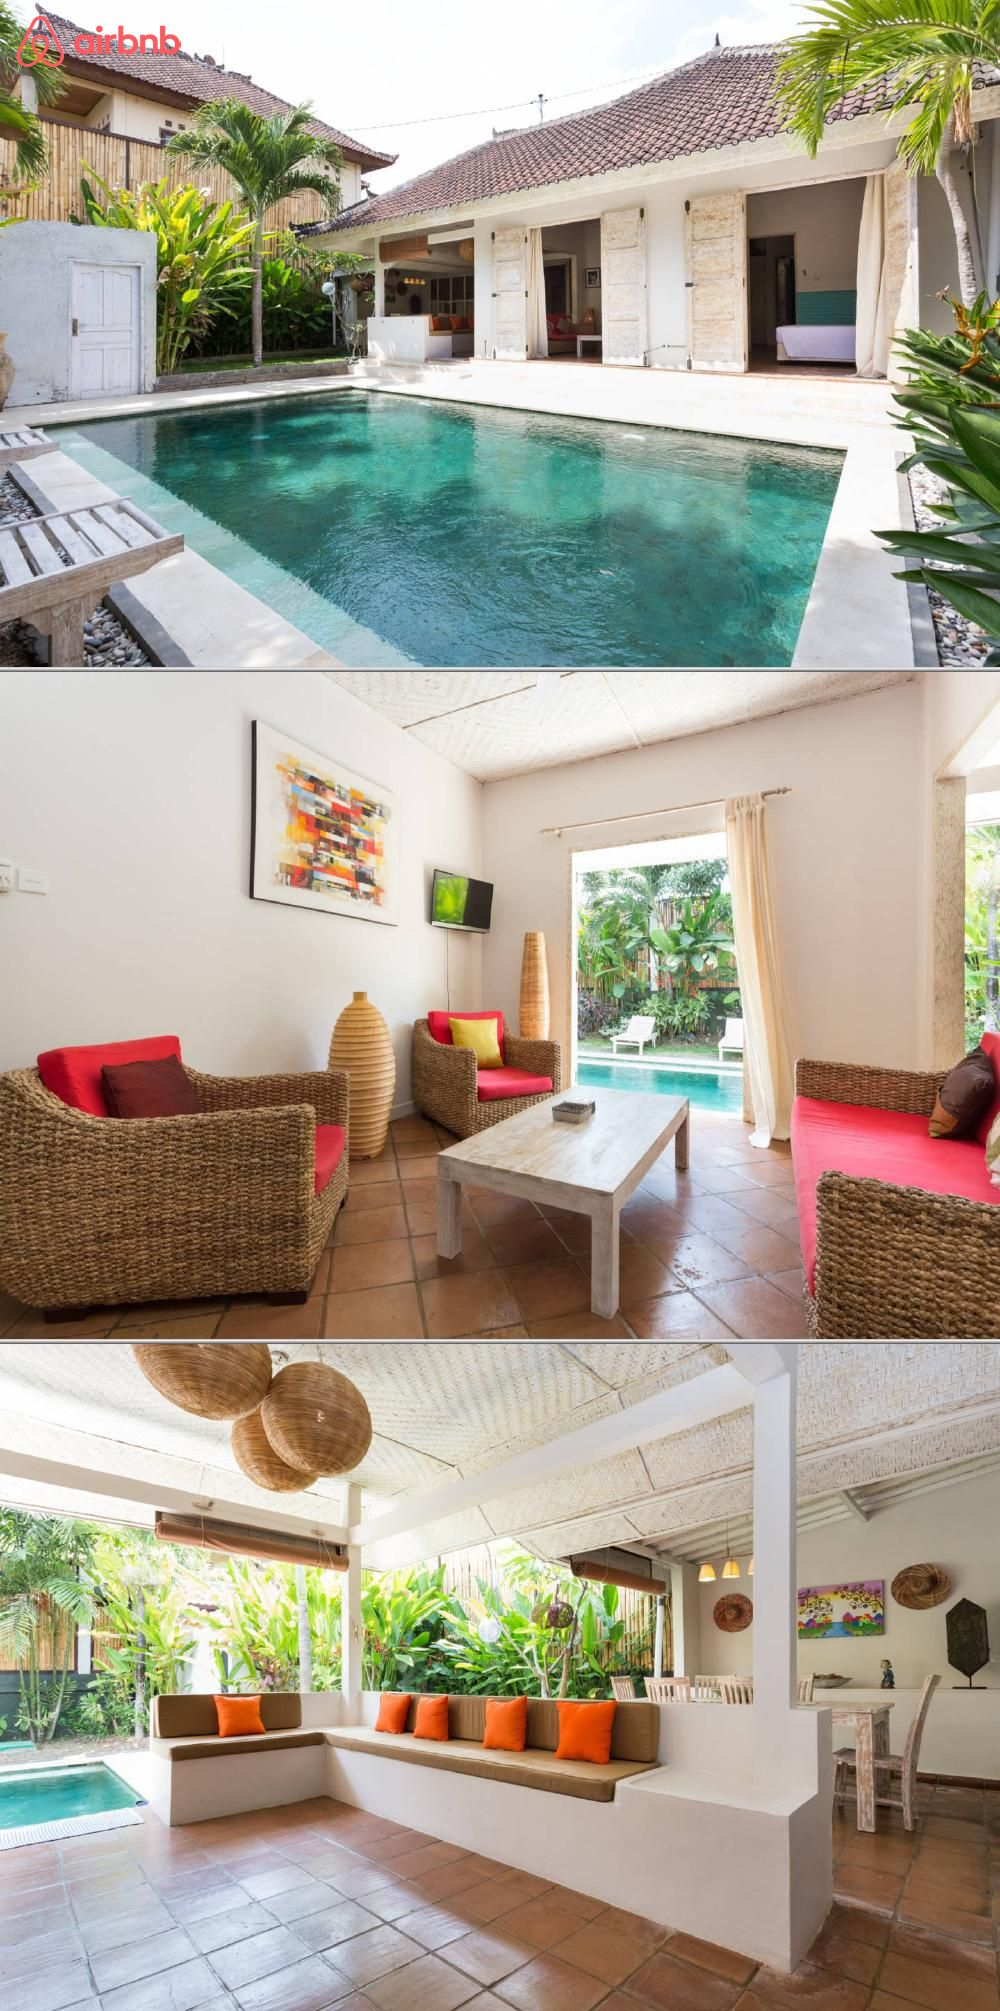 Rumah Pascalex Villas For Rent In Kuta Utara Bright Homes House Home